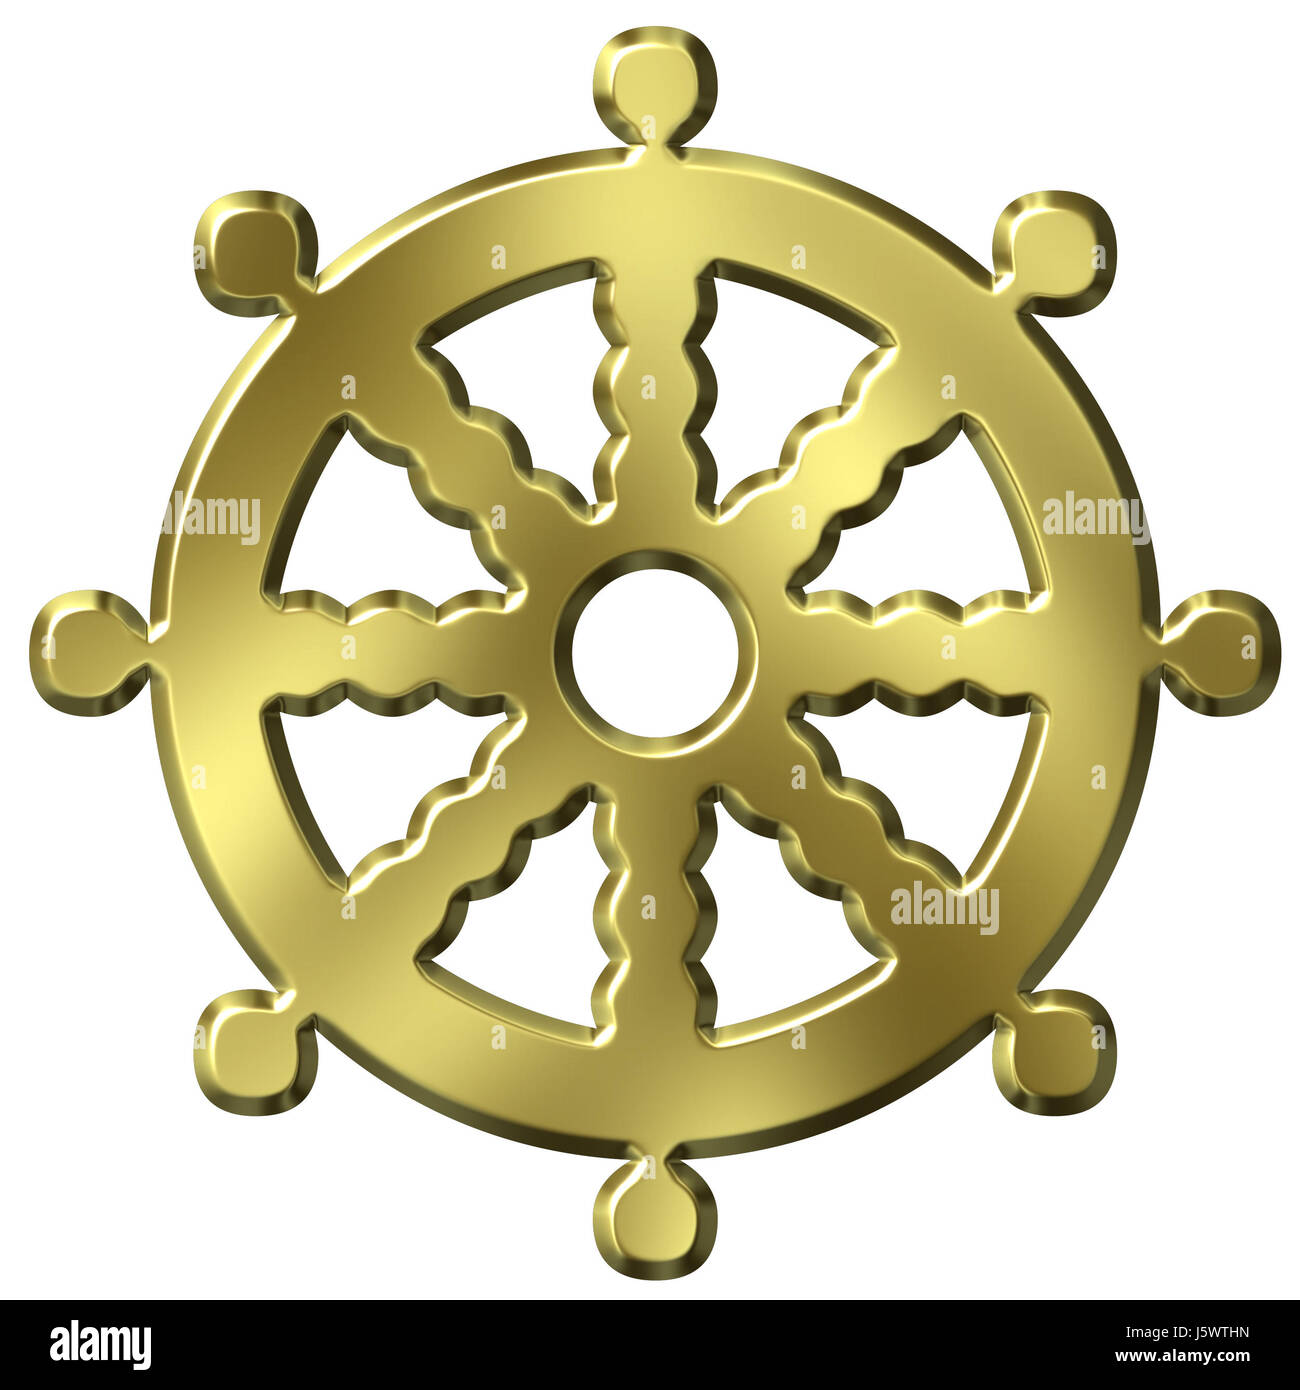 All The Symbols Hinduism